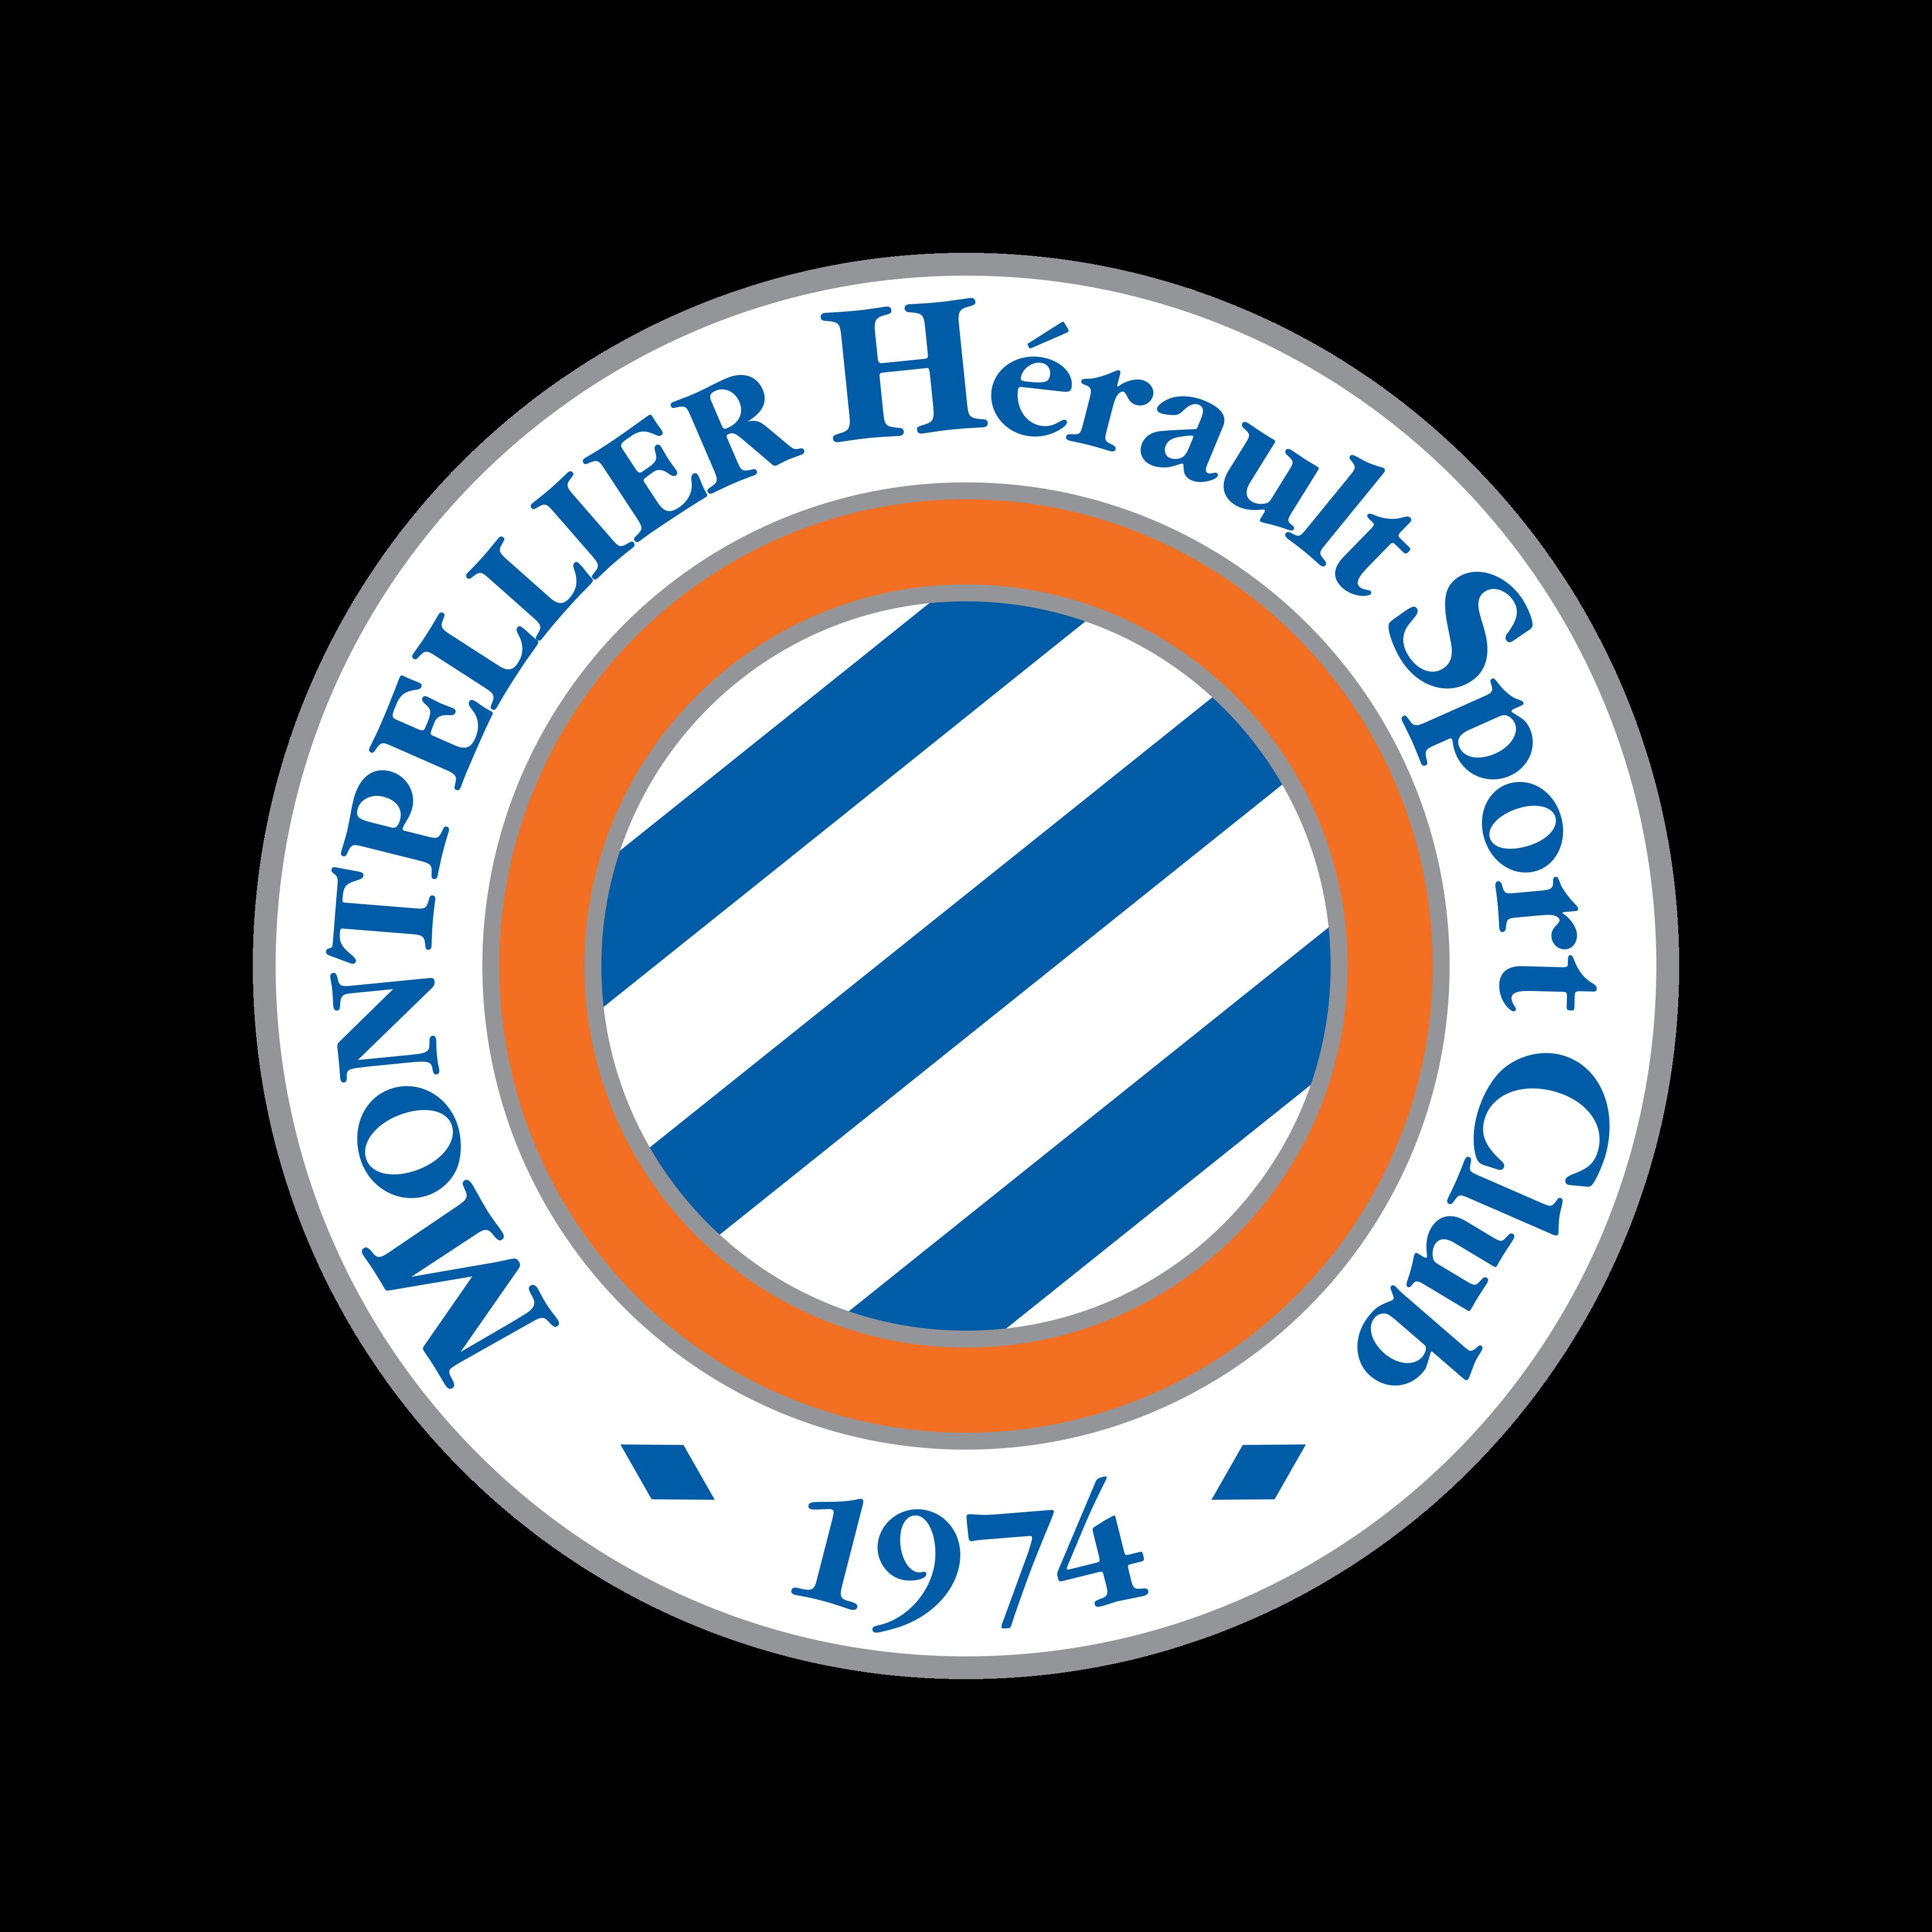 montpellier logo 0 - Montpellier Logo - Montpellier Hérault Sport Club